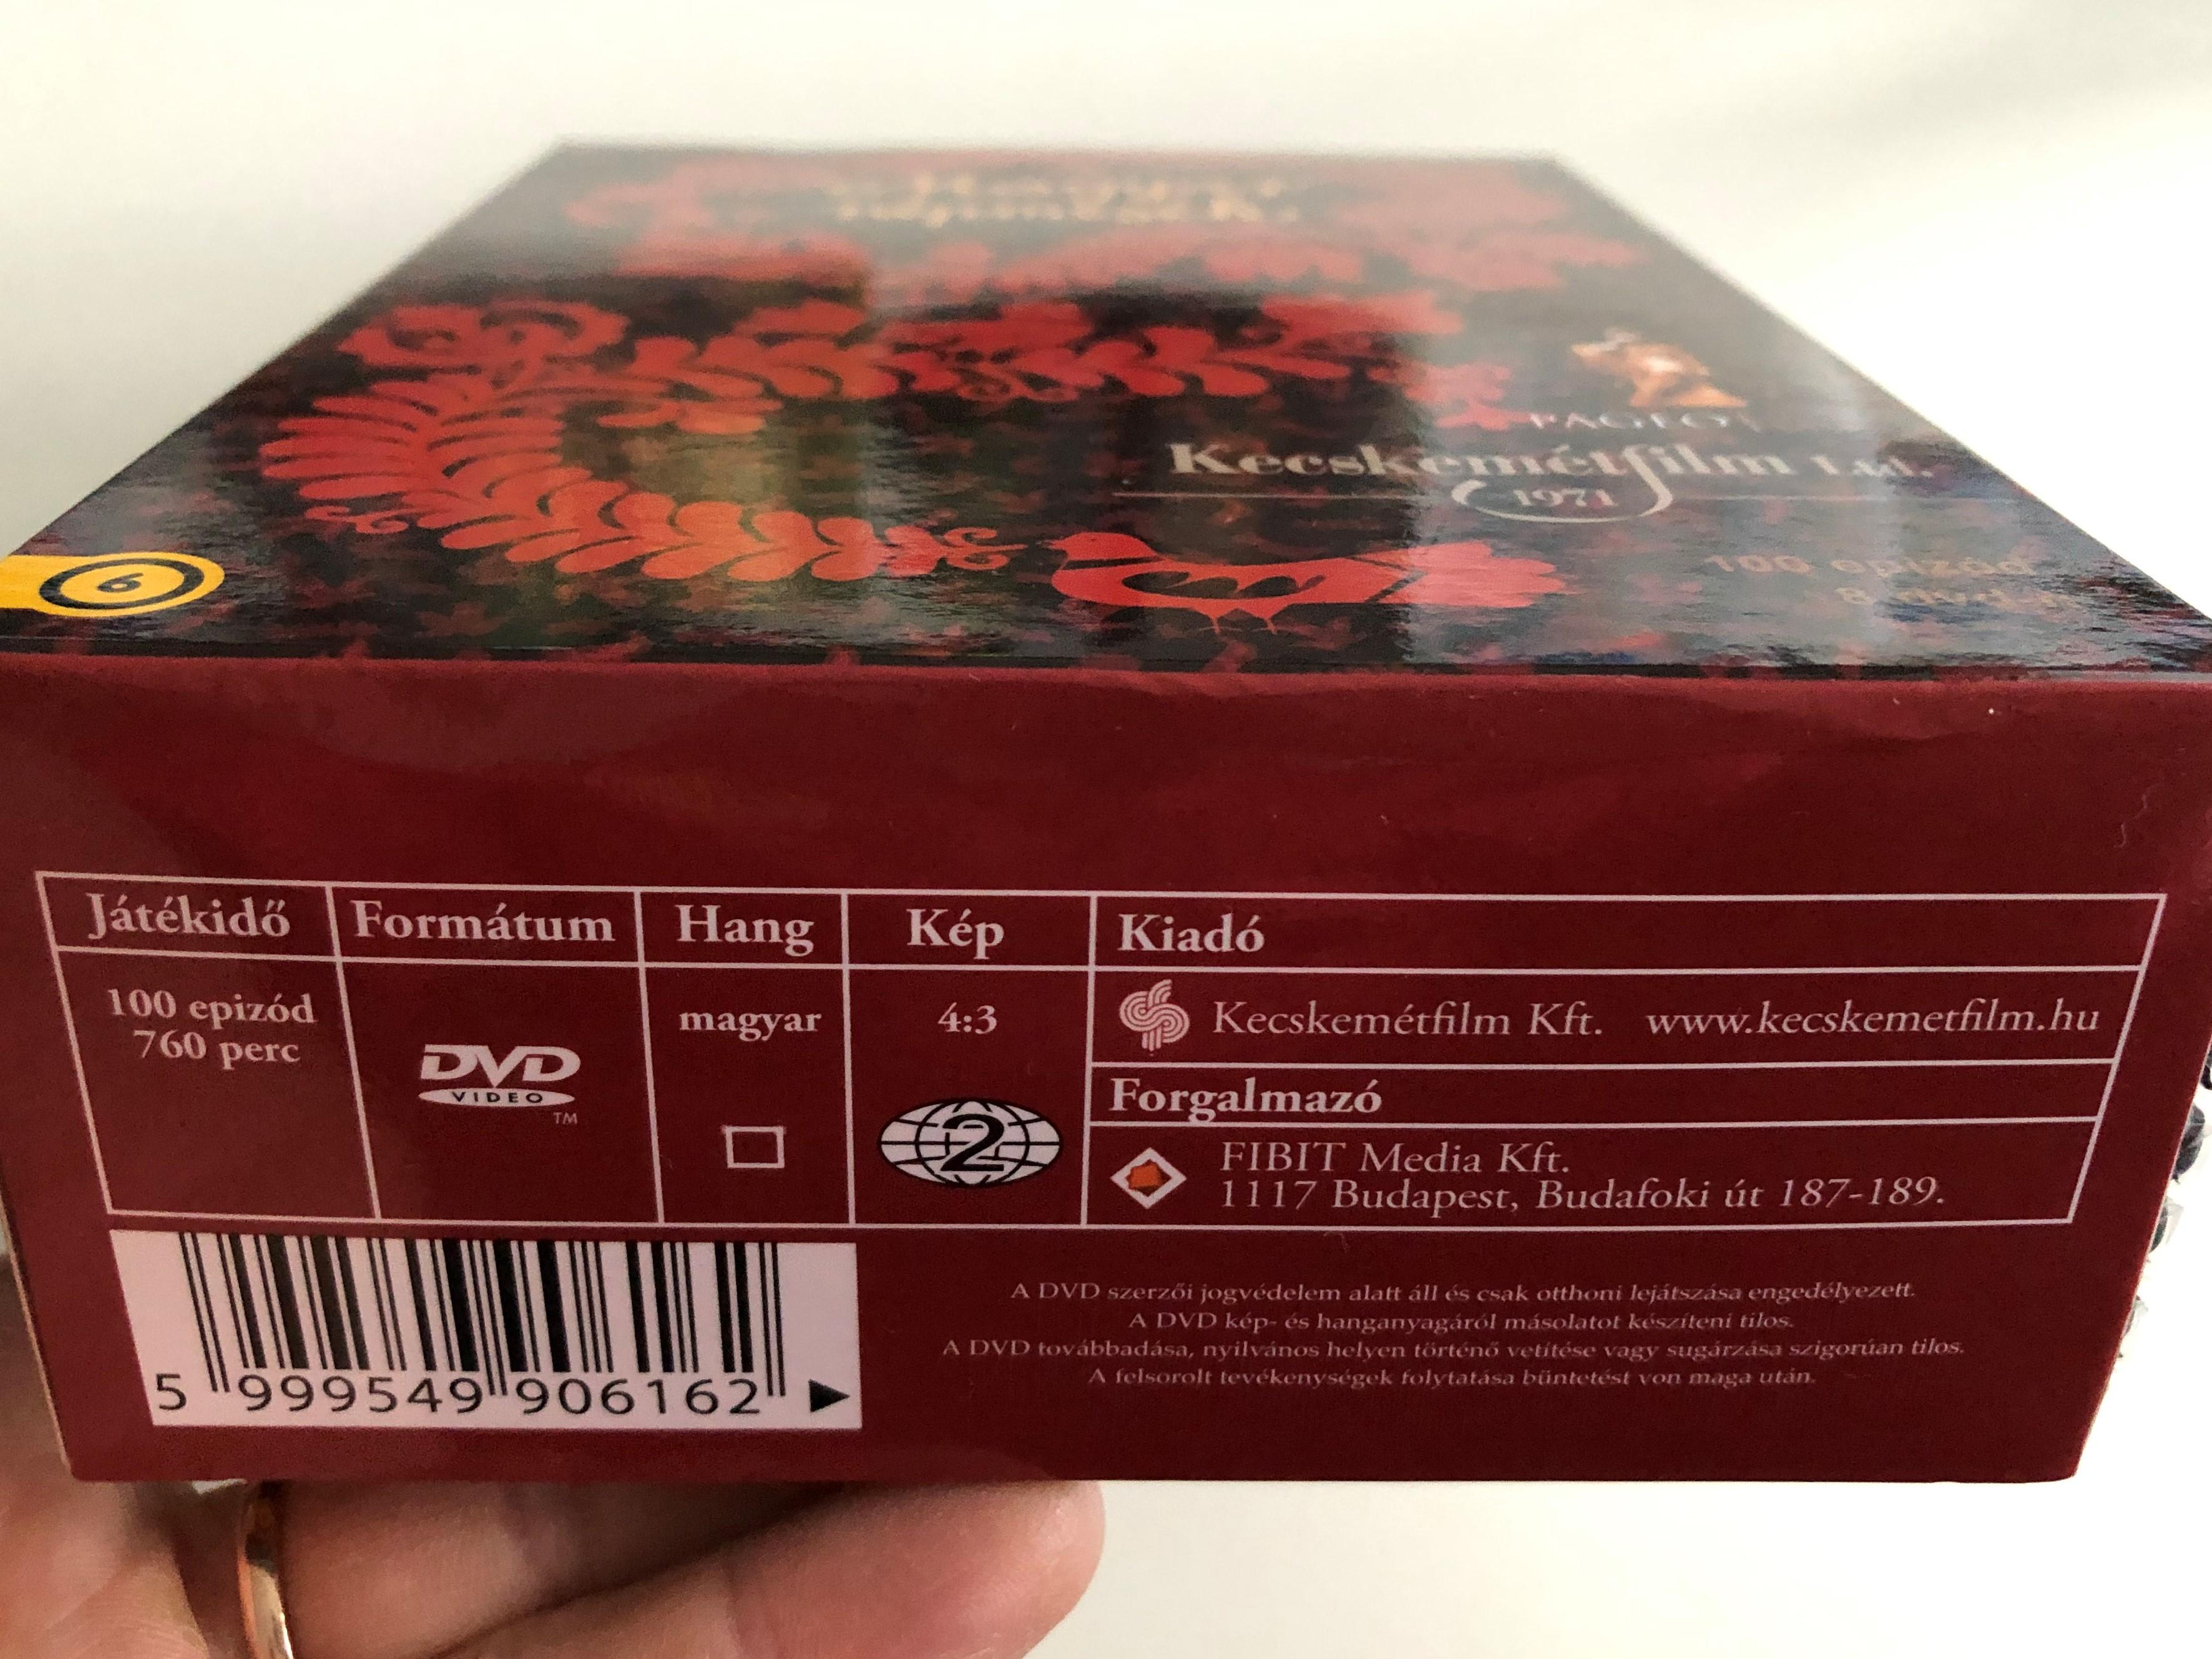 magyar-n-pmes-k-dvd-box-hungarian-folk-tales-set-100-episodes-on-8-dvds-100-epiz-d-8-dvd-n-kecskem-tfilm-directed-by-jankovics-marcell-horv-th-m-ria-nagy-lajos-4-.jpg